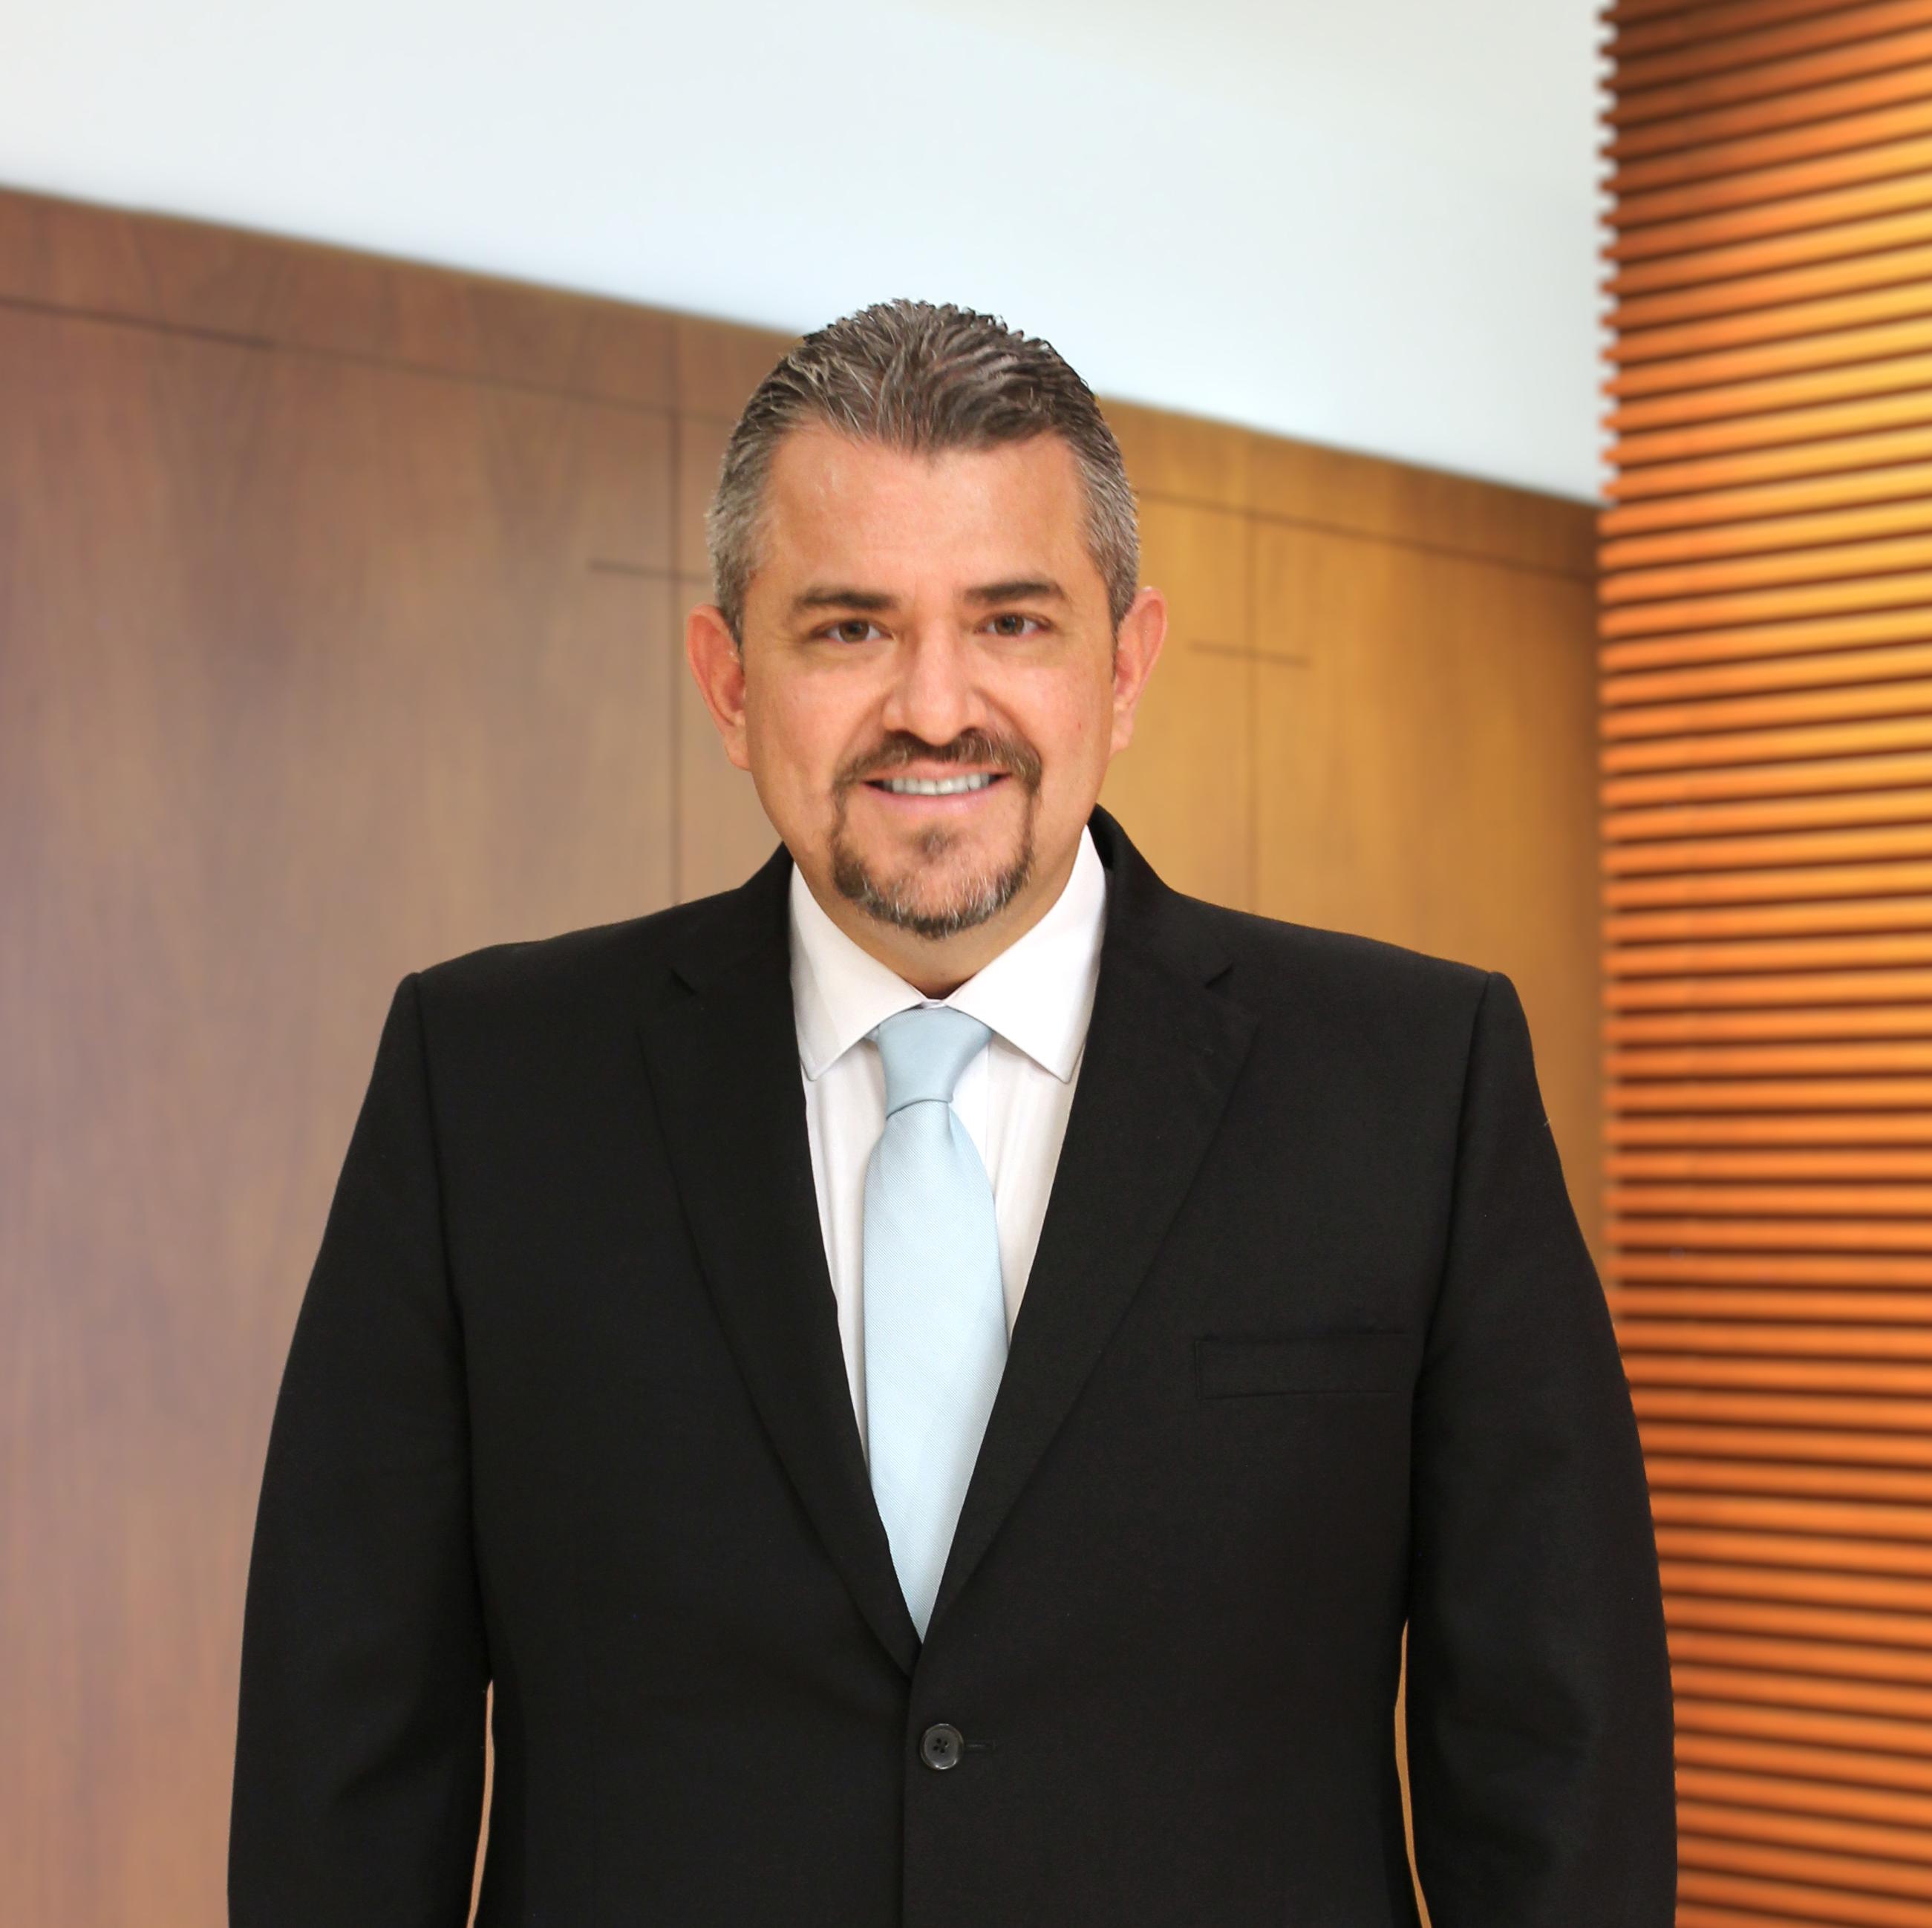 Ricardo Aguilar Abe